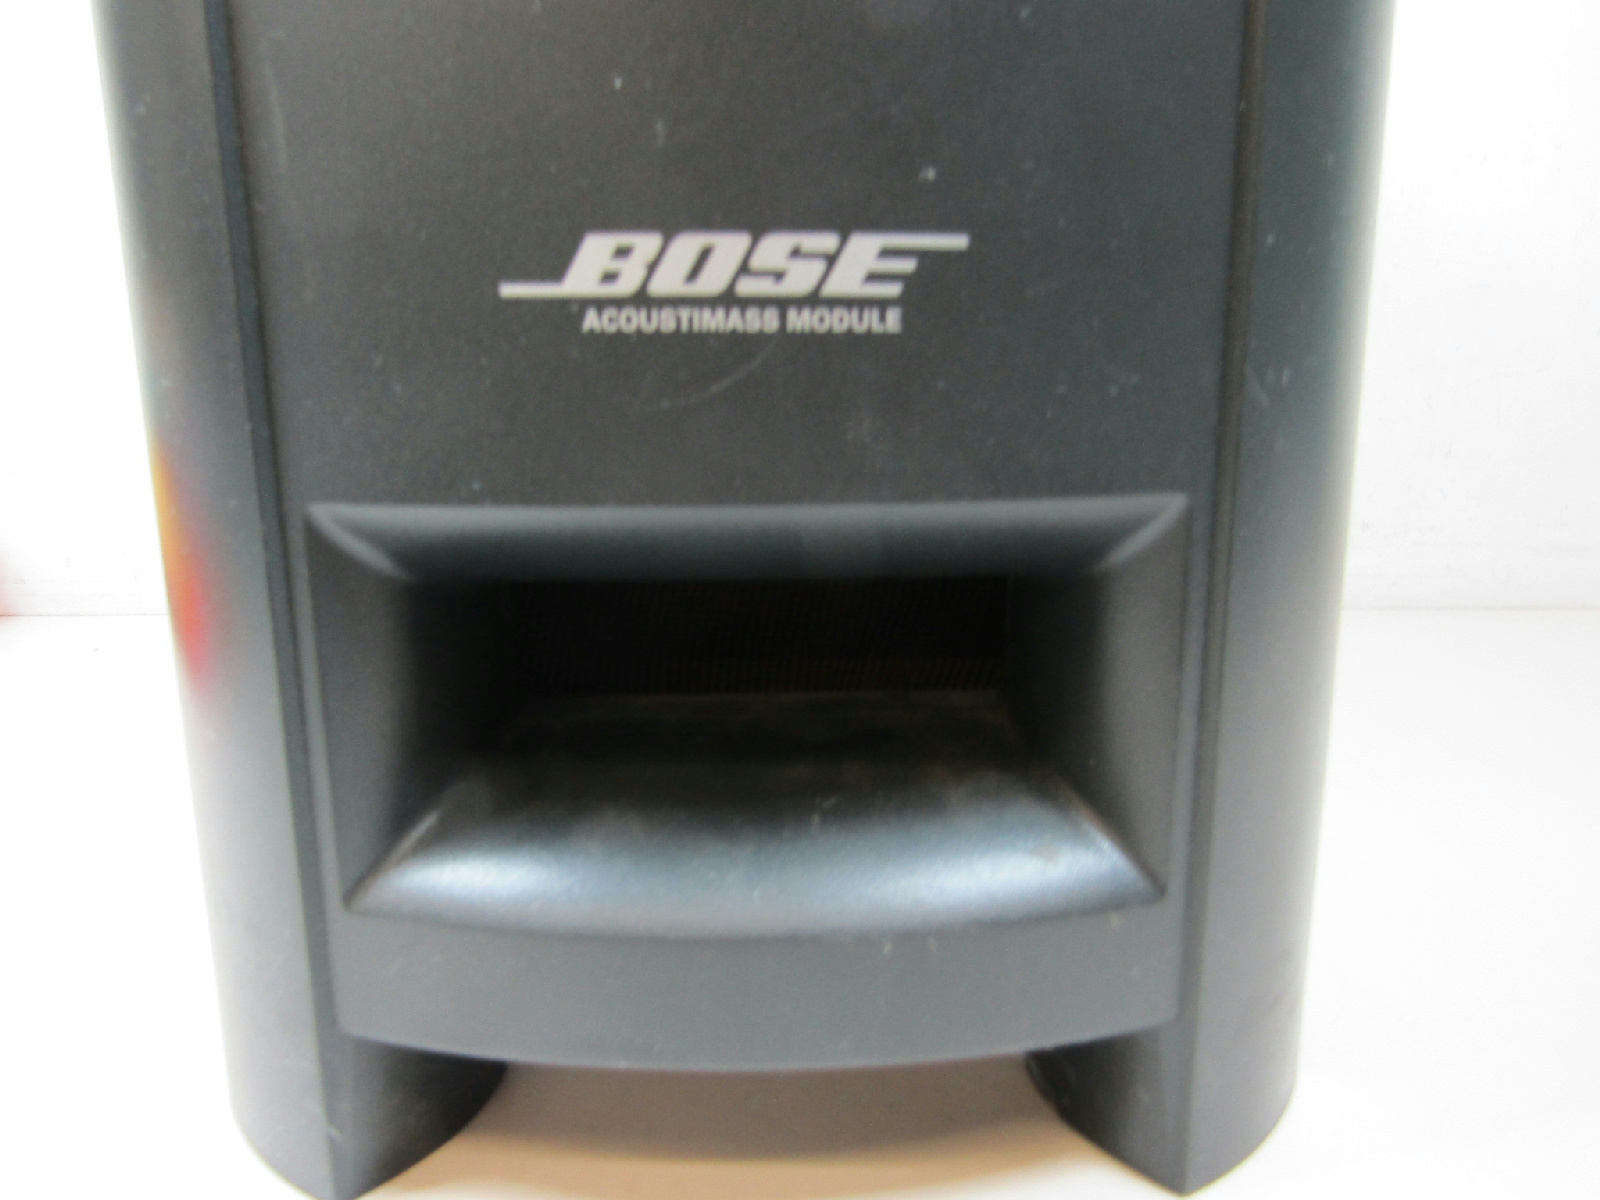 bose acoustimass module subwoofer for ps 3 2 1 ii powered. Black Bedroom Furniture Sets. Home Design Ideas